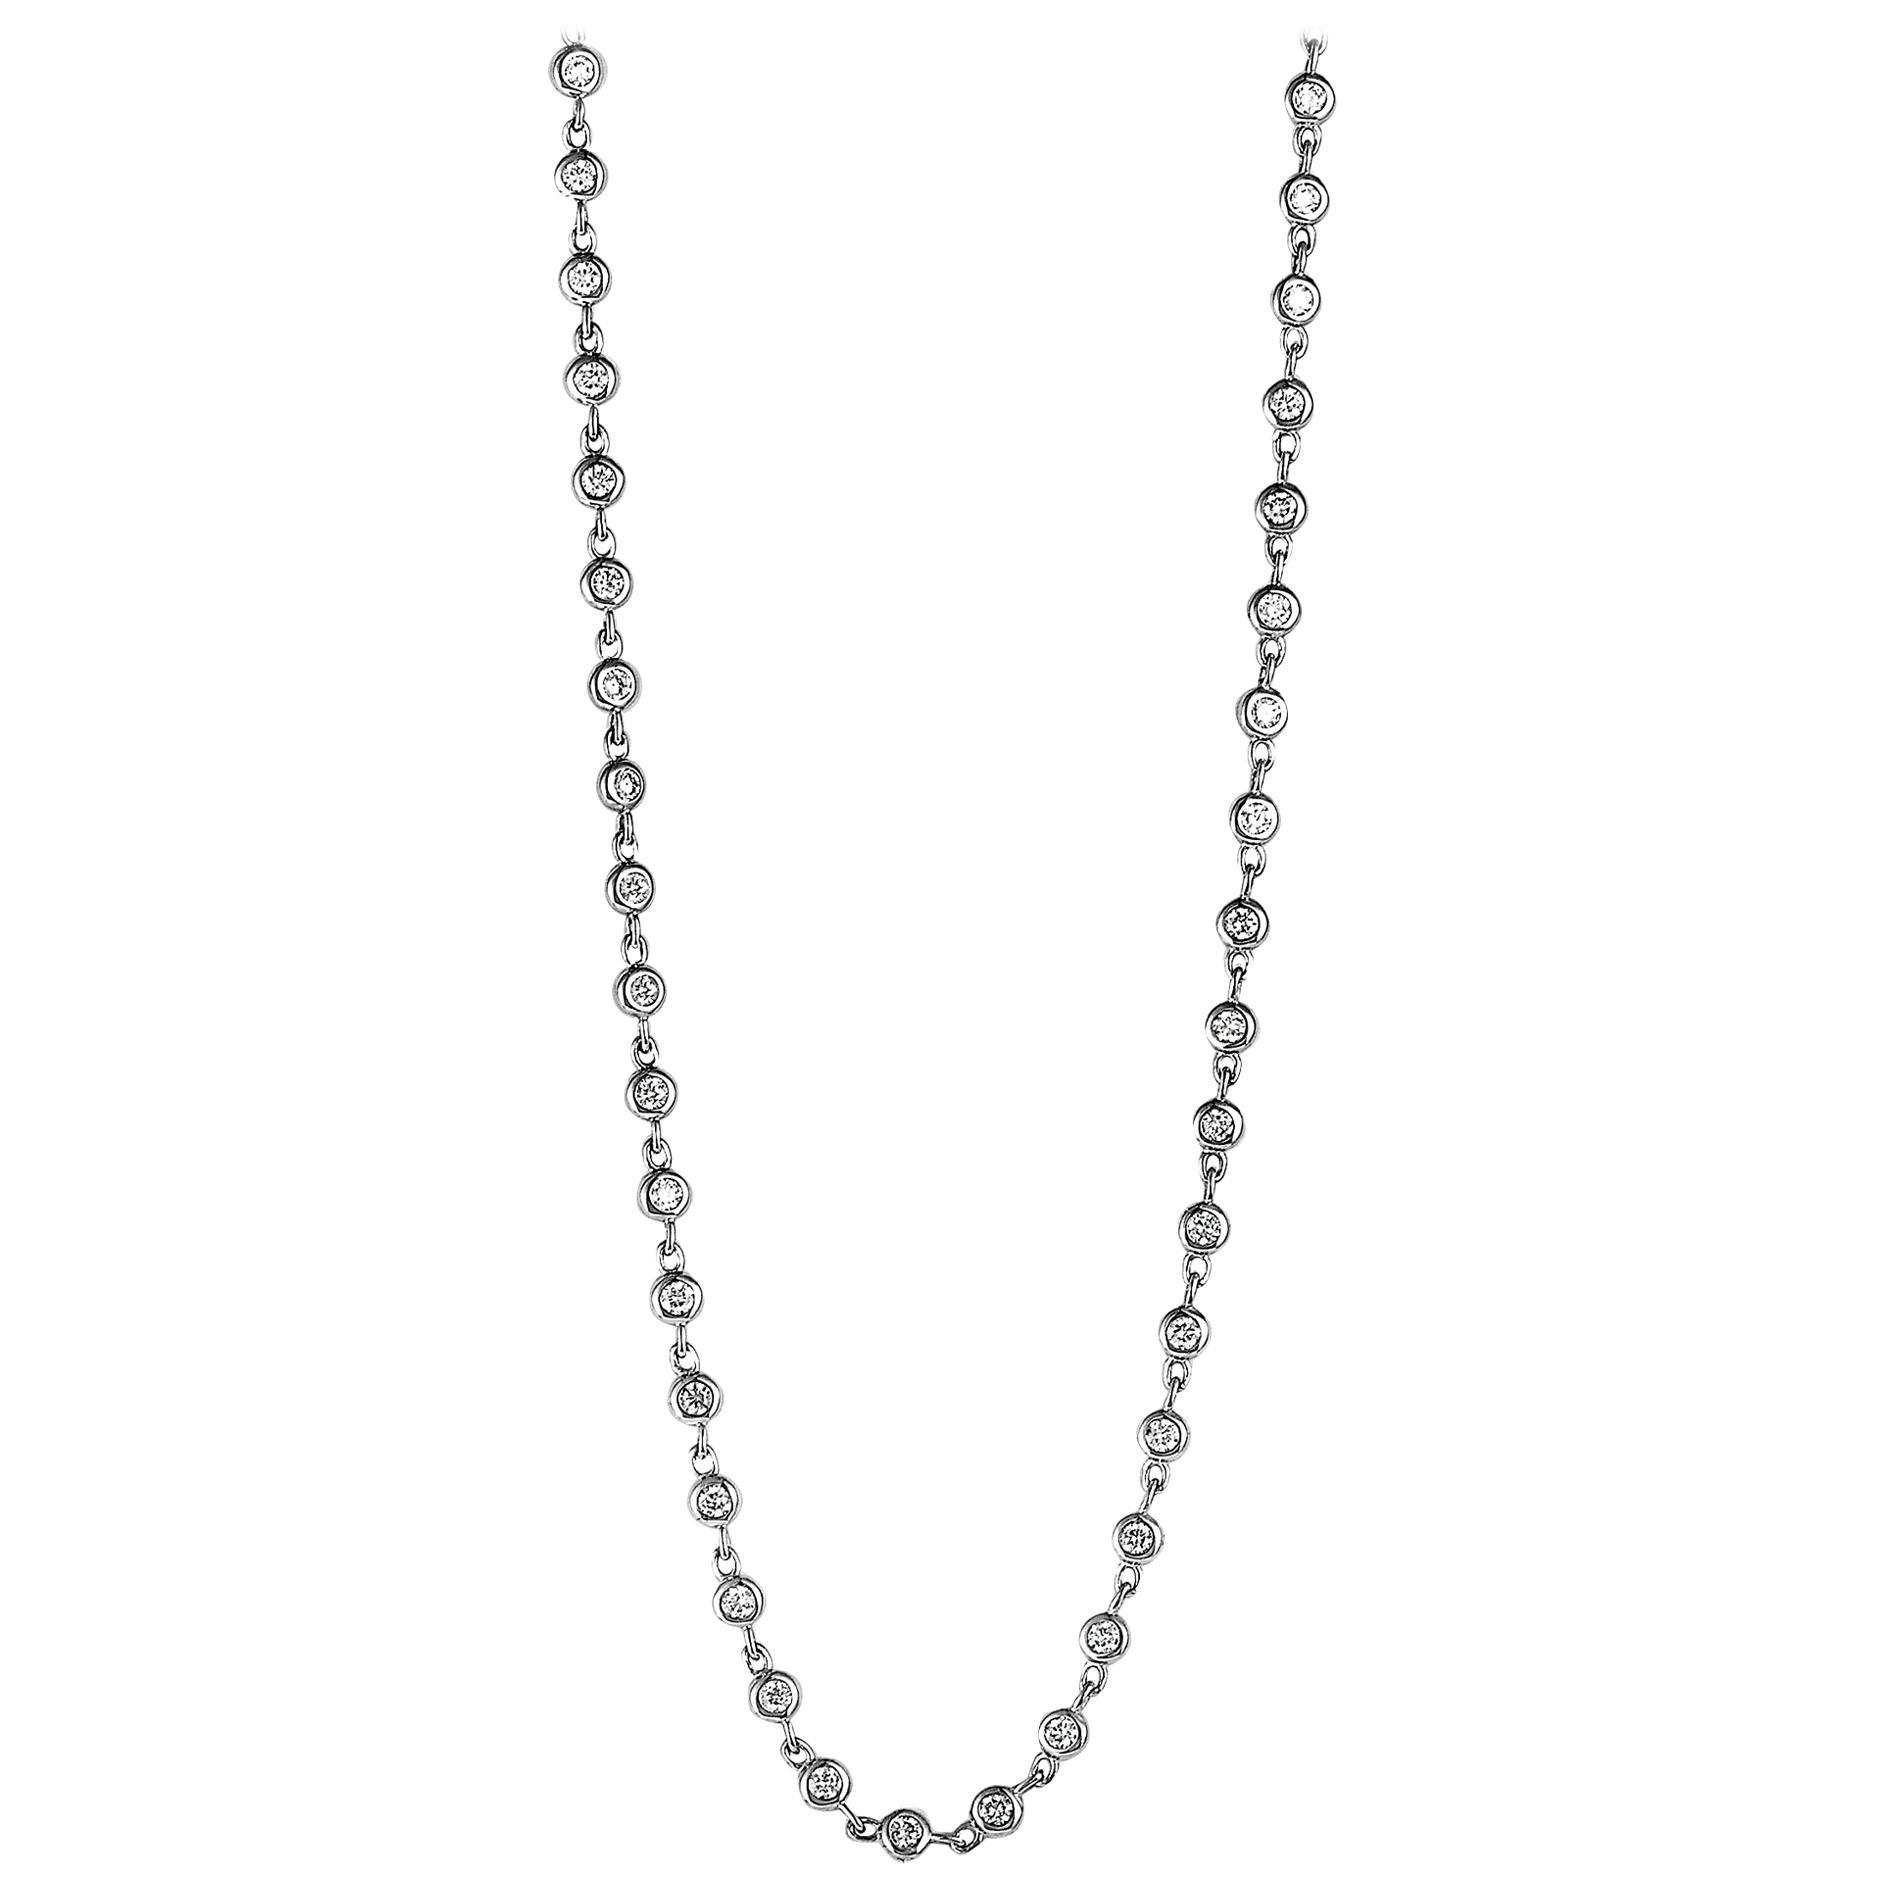 Lb Exclusive 18 Karat Yellow Gold Round Diamonds Sautoir Long Necklace With Regard To 2019 Diamond Sautoir Necklaces In Yellow Gold (View 6 of 25)